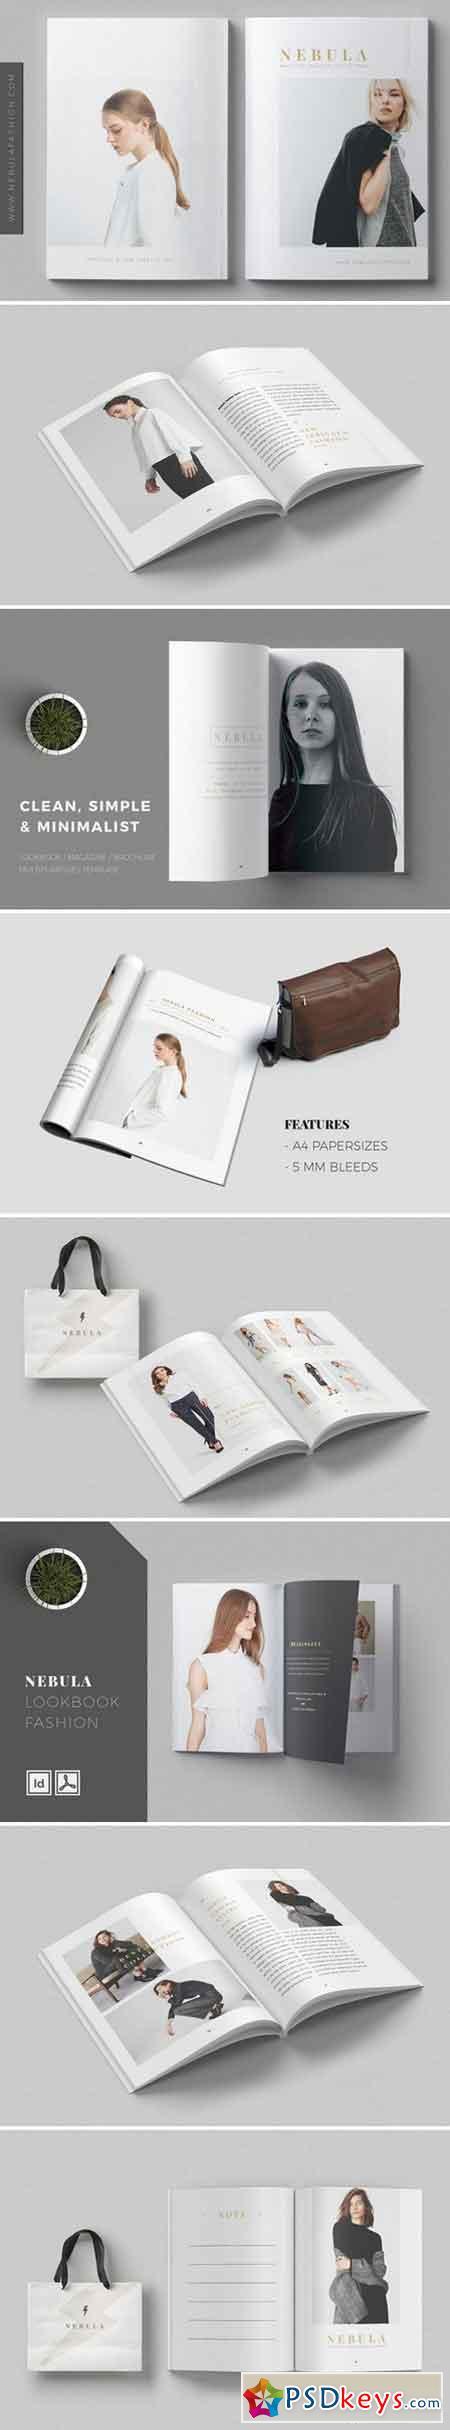 NEBULA Lookbook Magazine Fashion 2357271